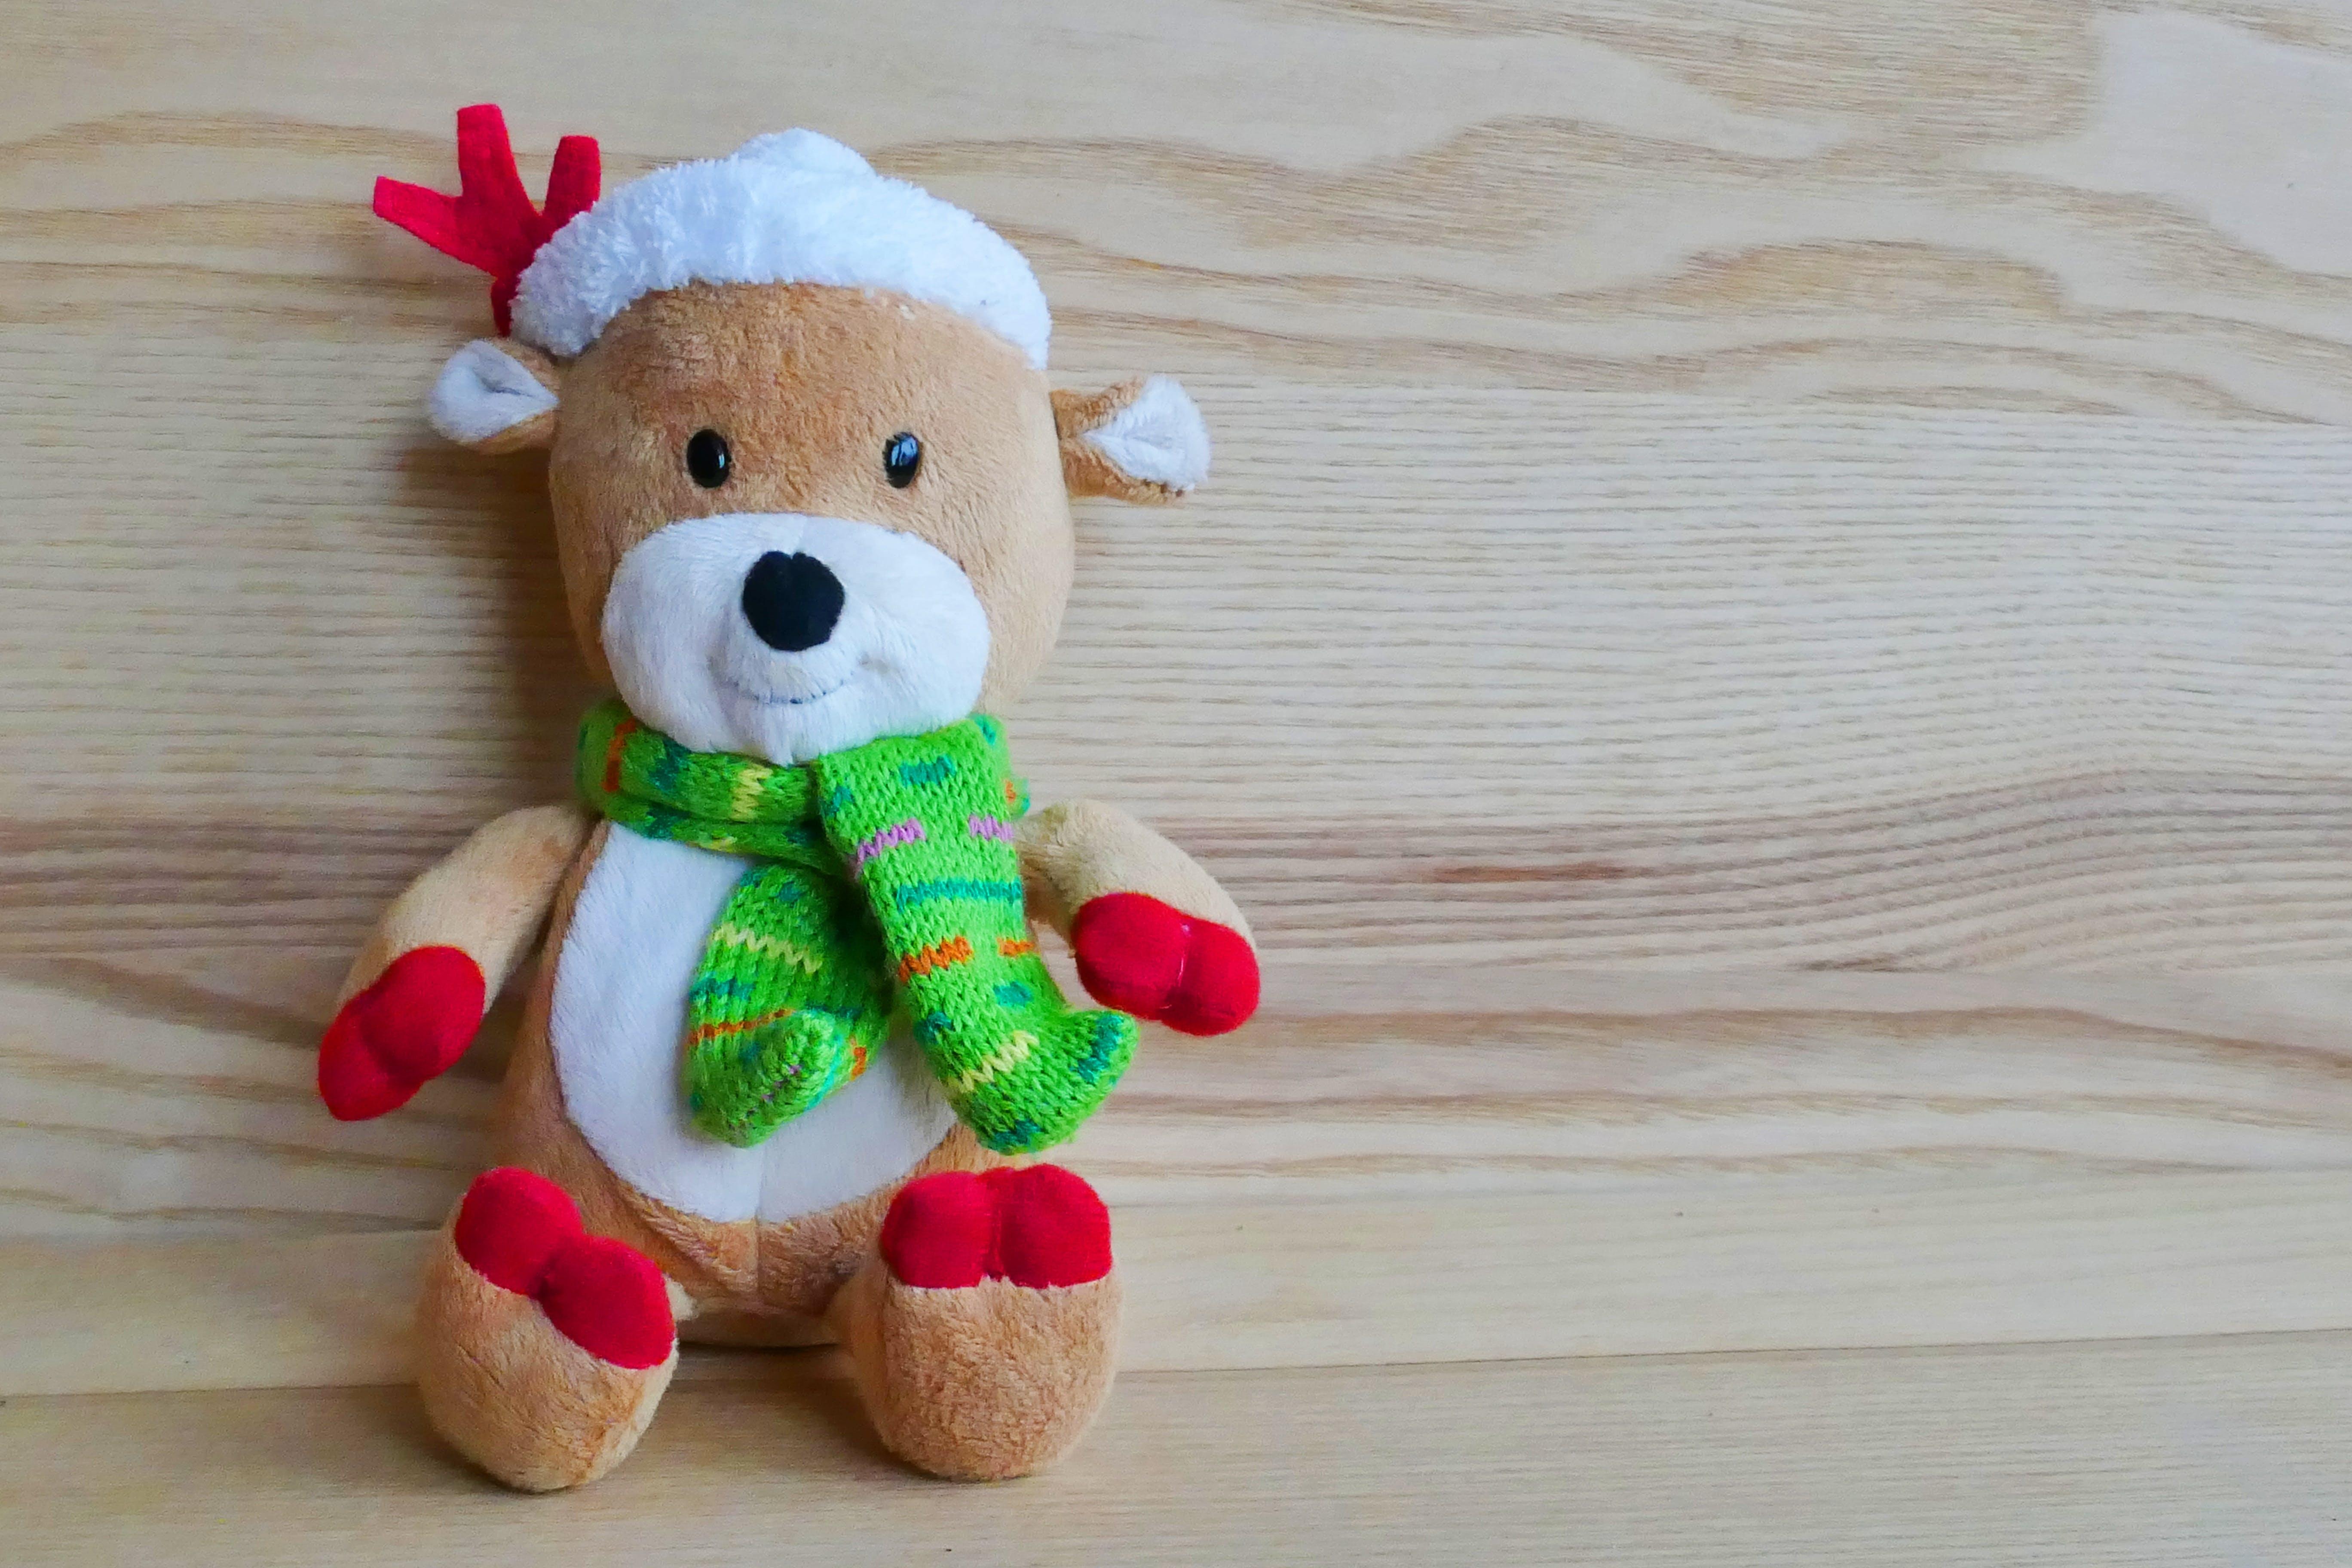 Brown Reindeer Plush Toy